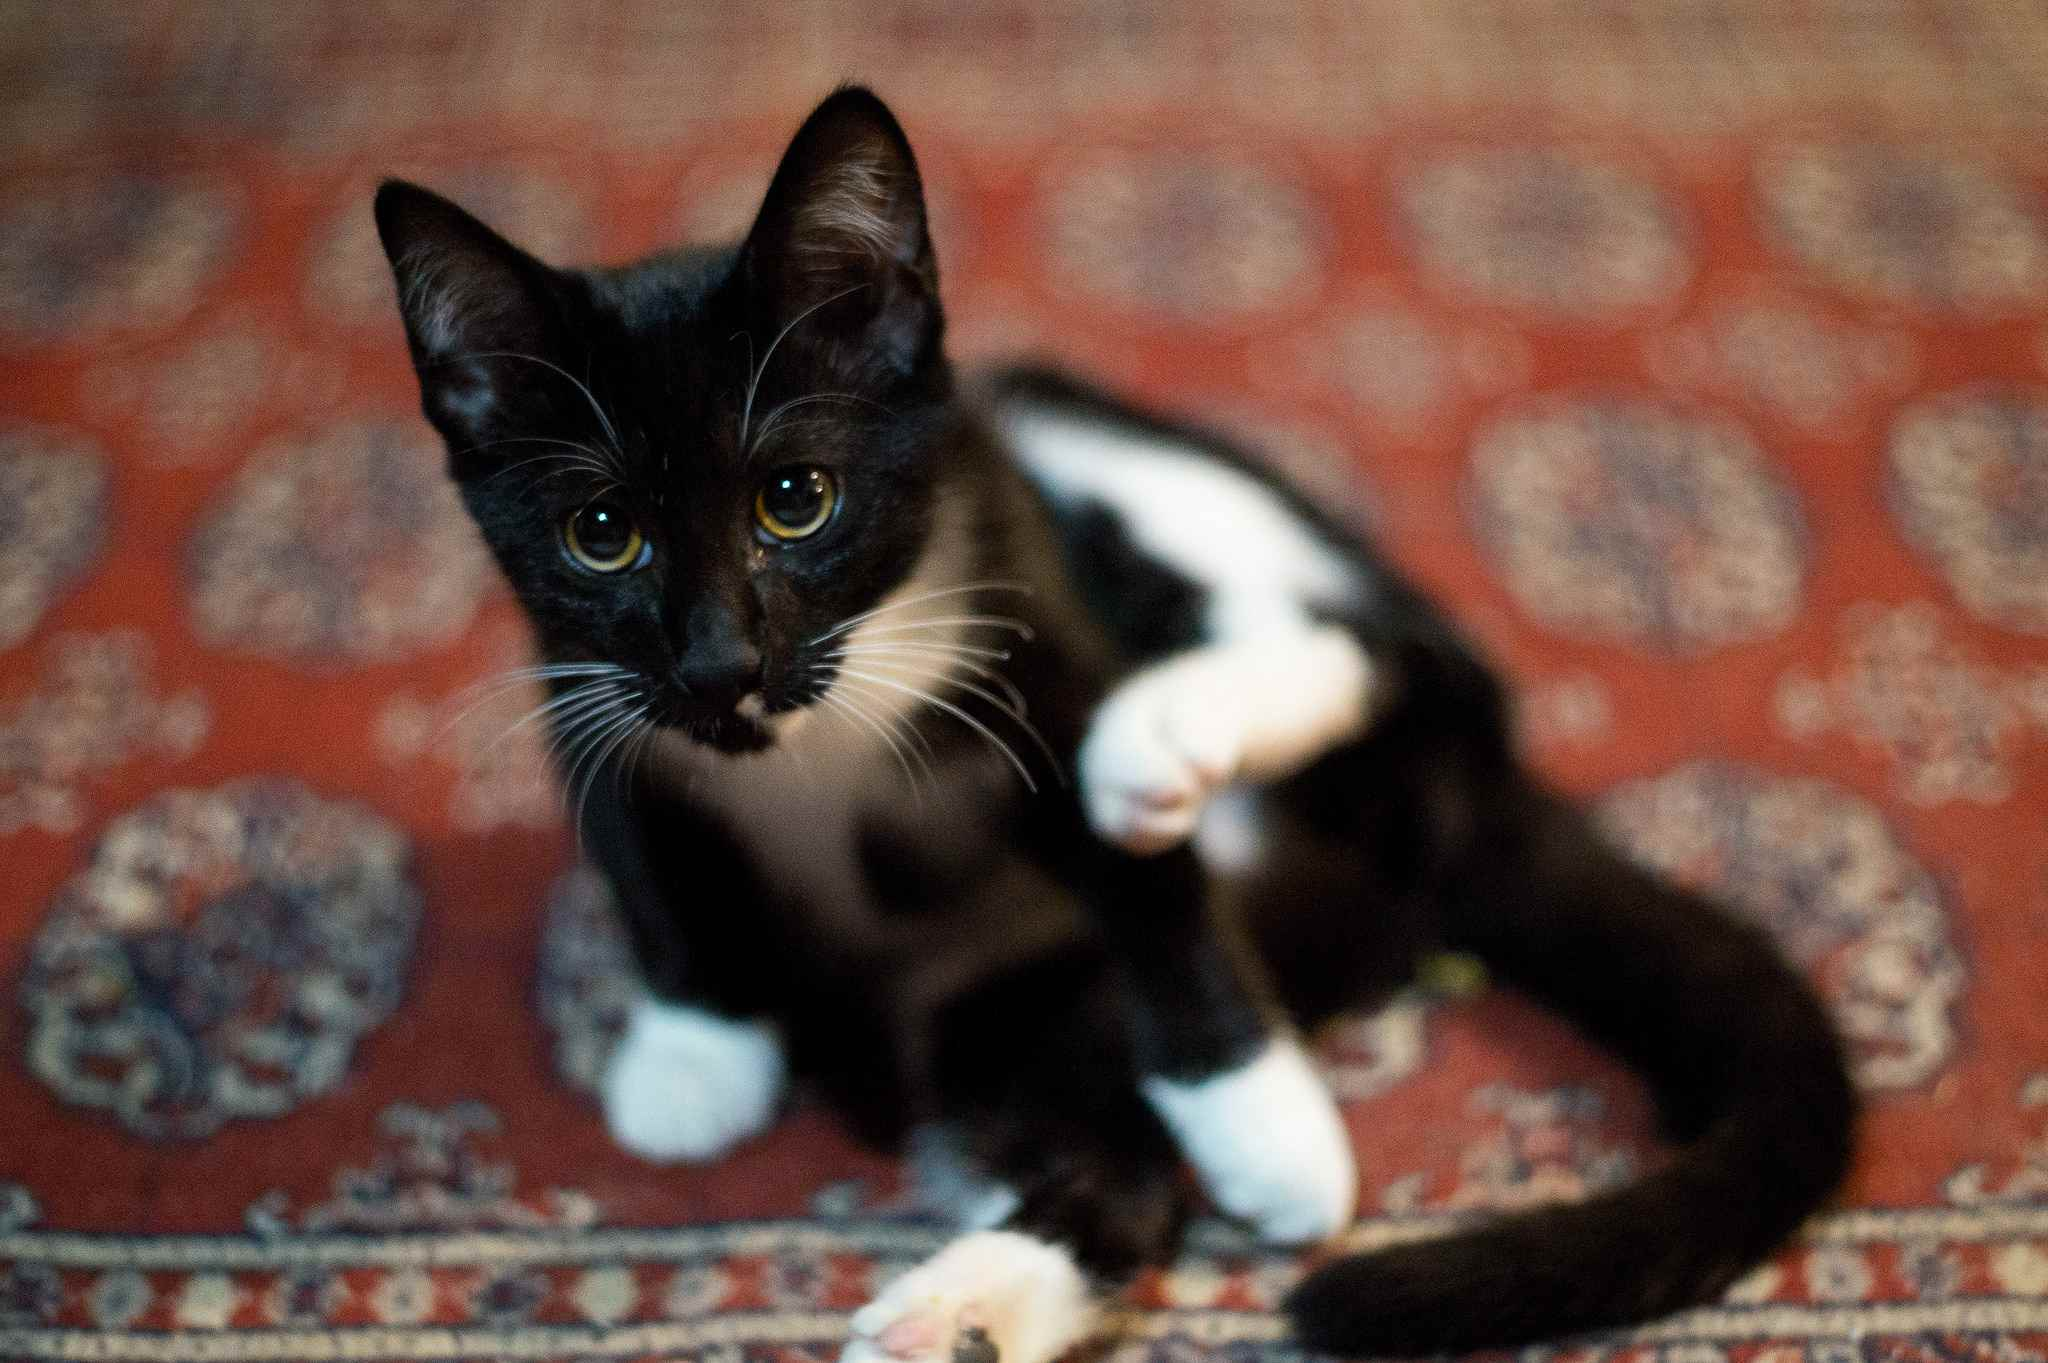 Tuxeo cat raising it's hind leg